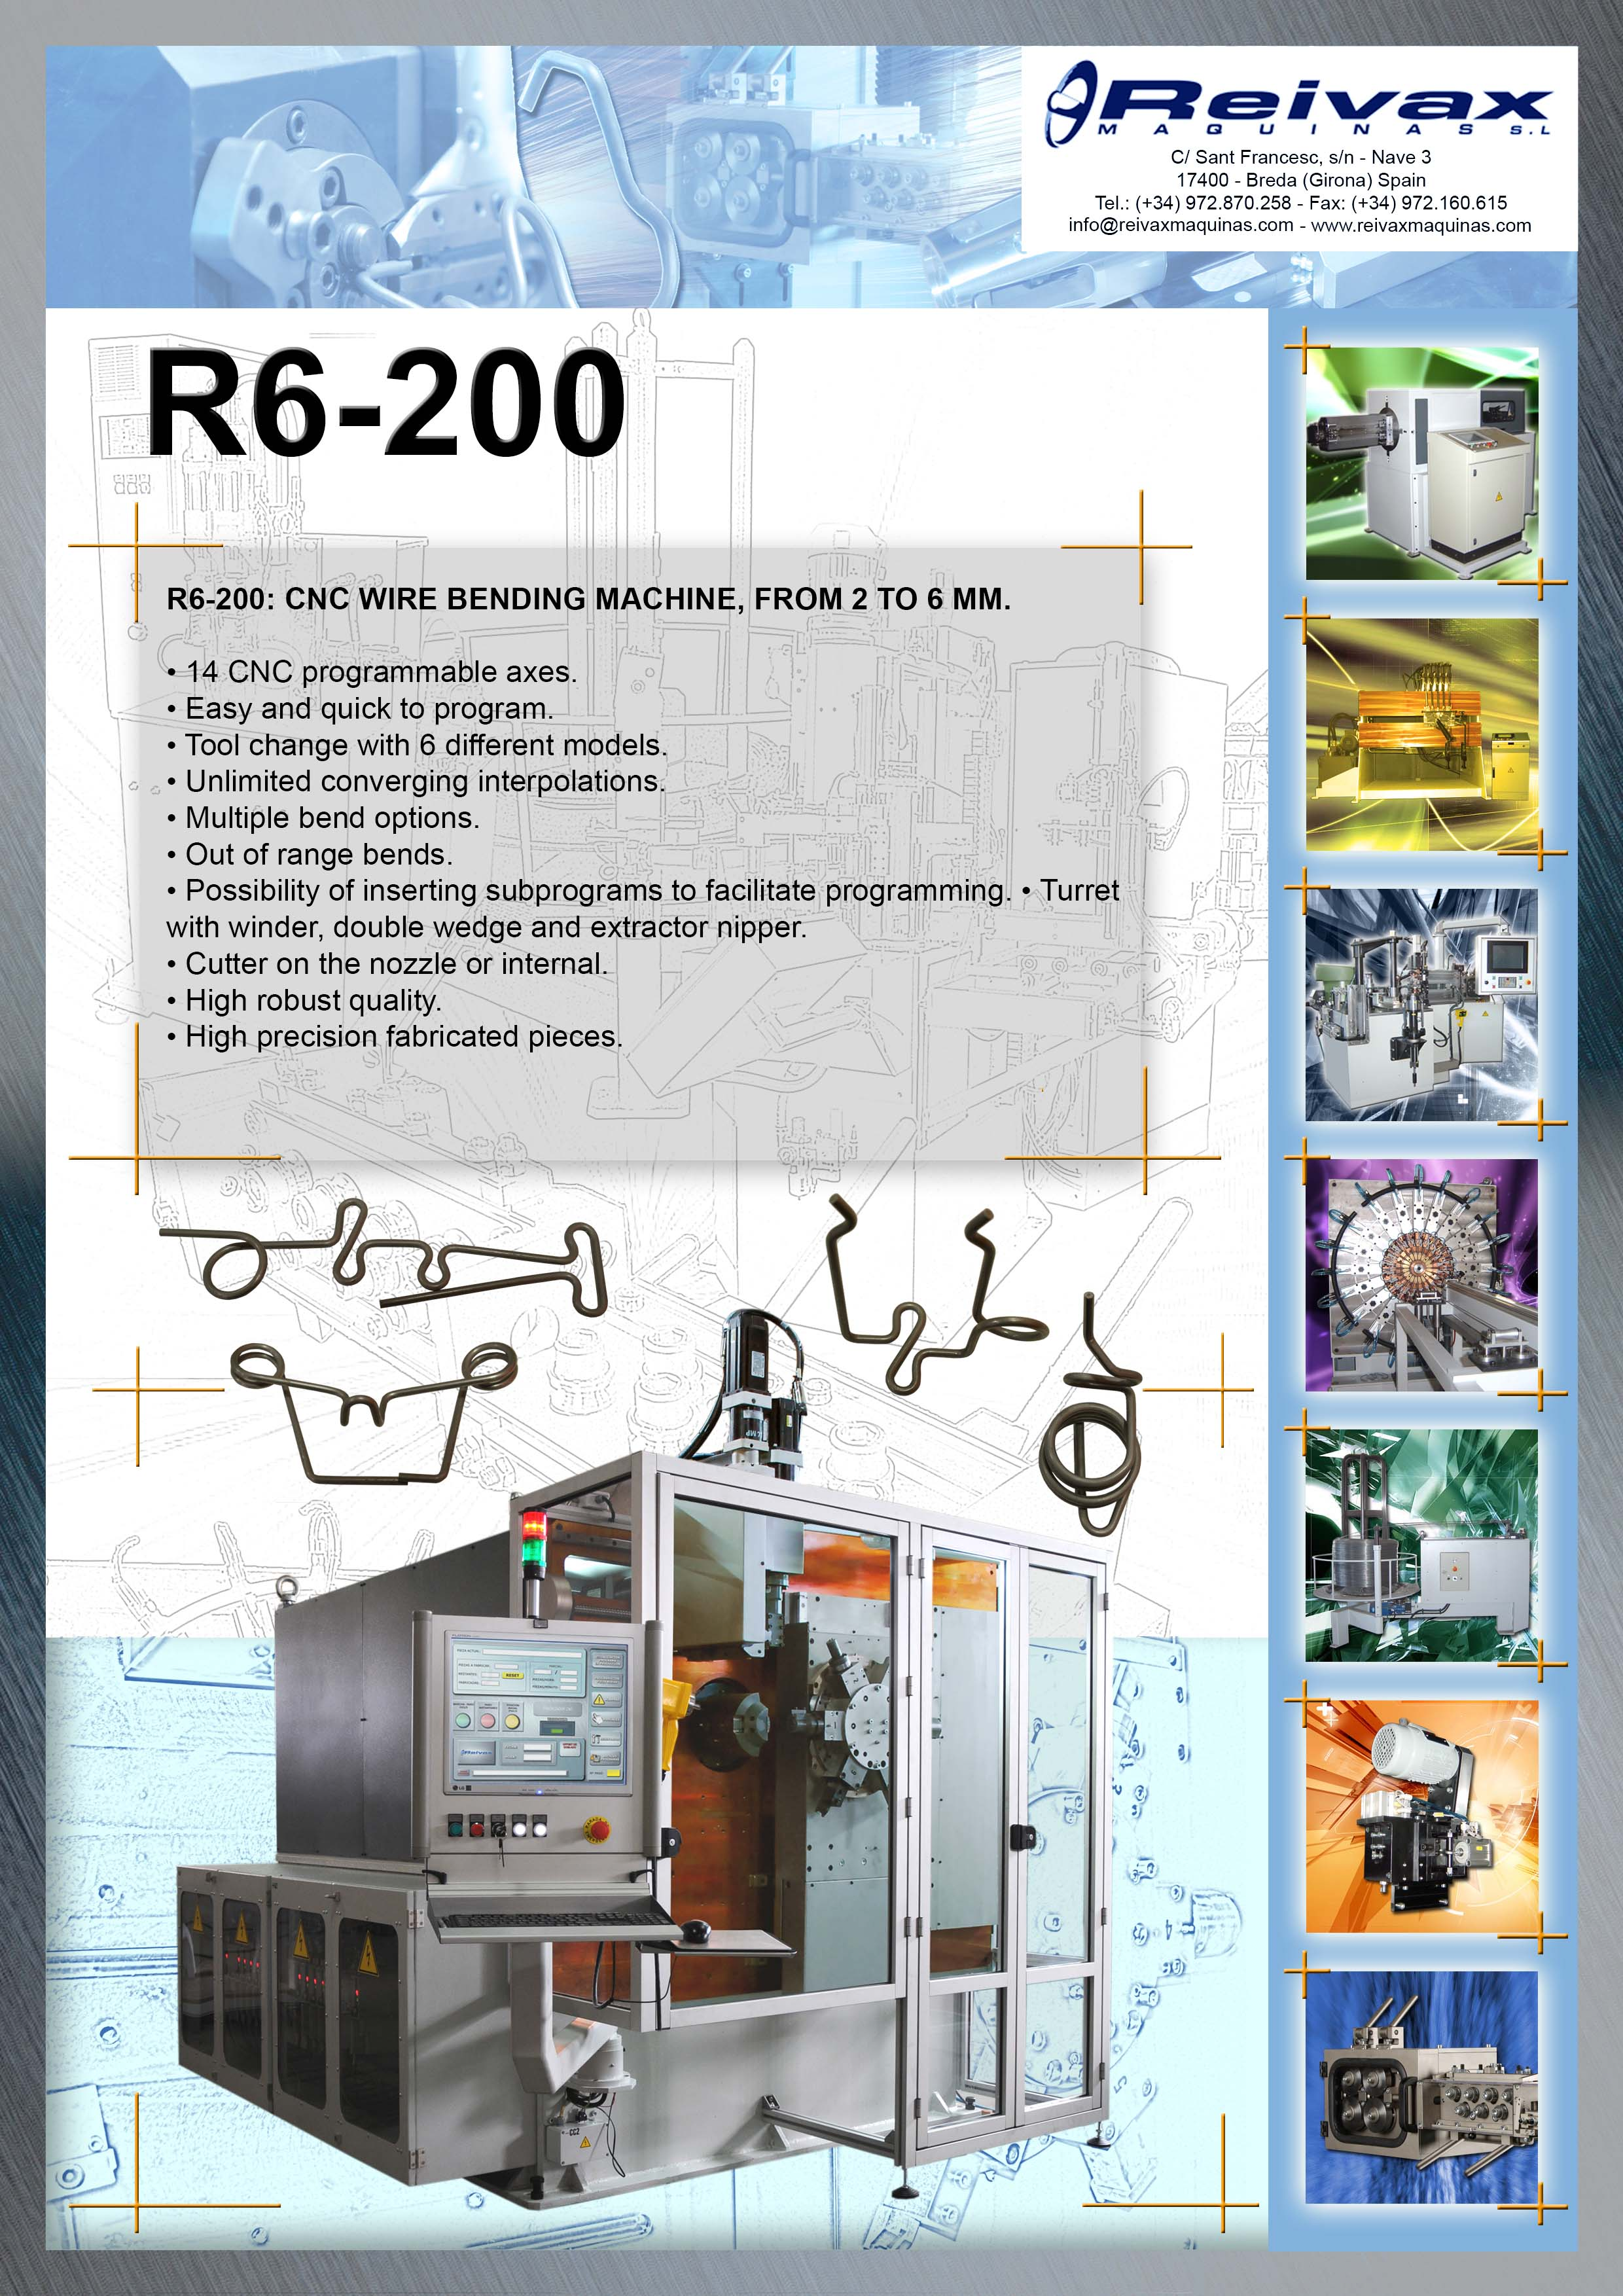 ReivaxMaquinas: Technical Details R6-200